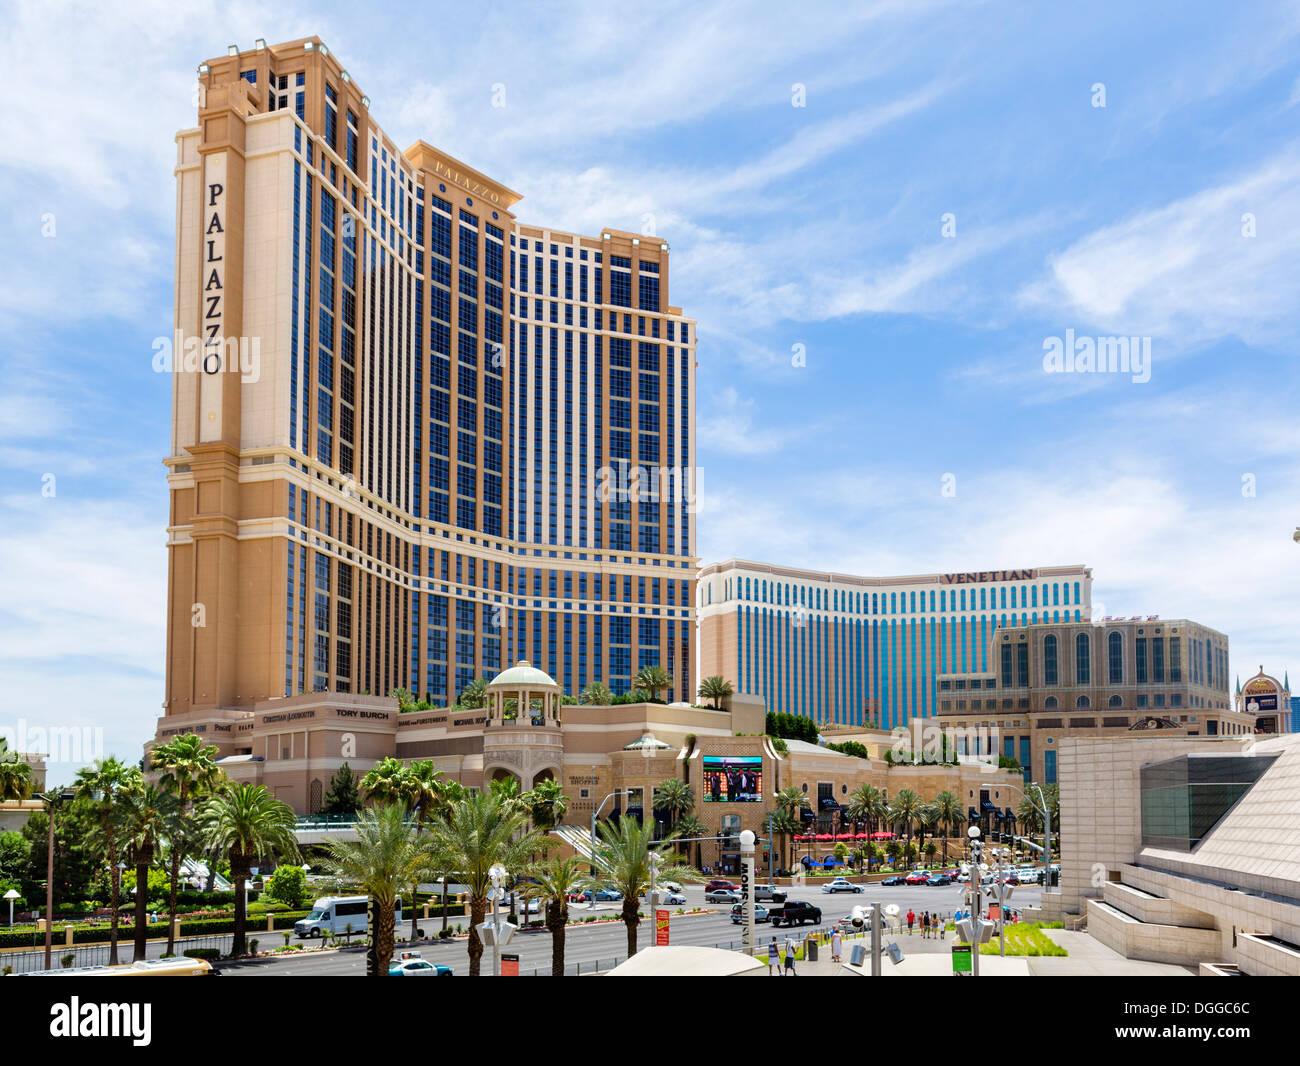 The Palazzo and Venetian hotels and casinos, Las Vegas Boulevard South (The Strip), Las Vegas, Nevada, USA - Stock Image